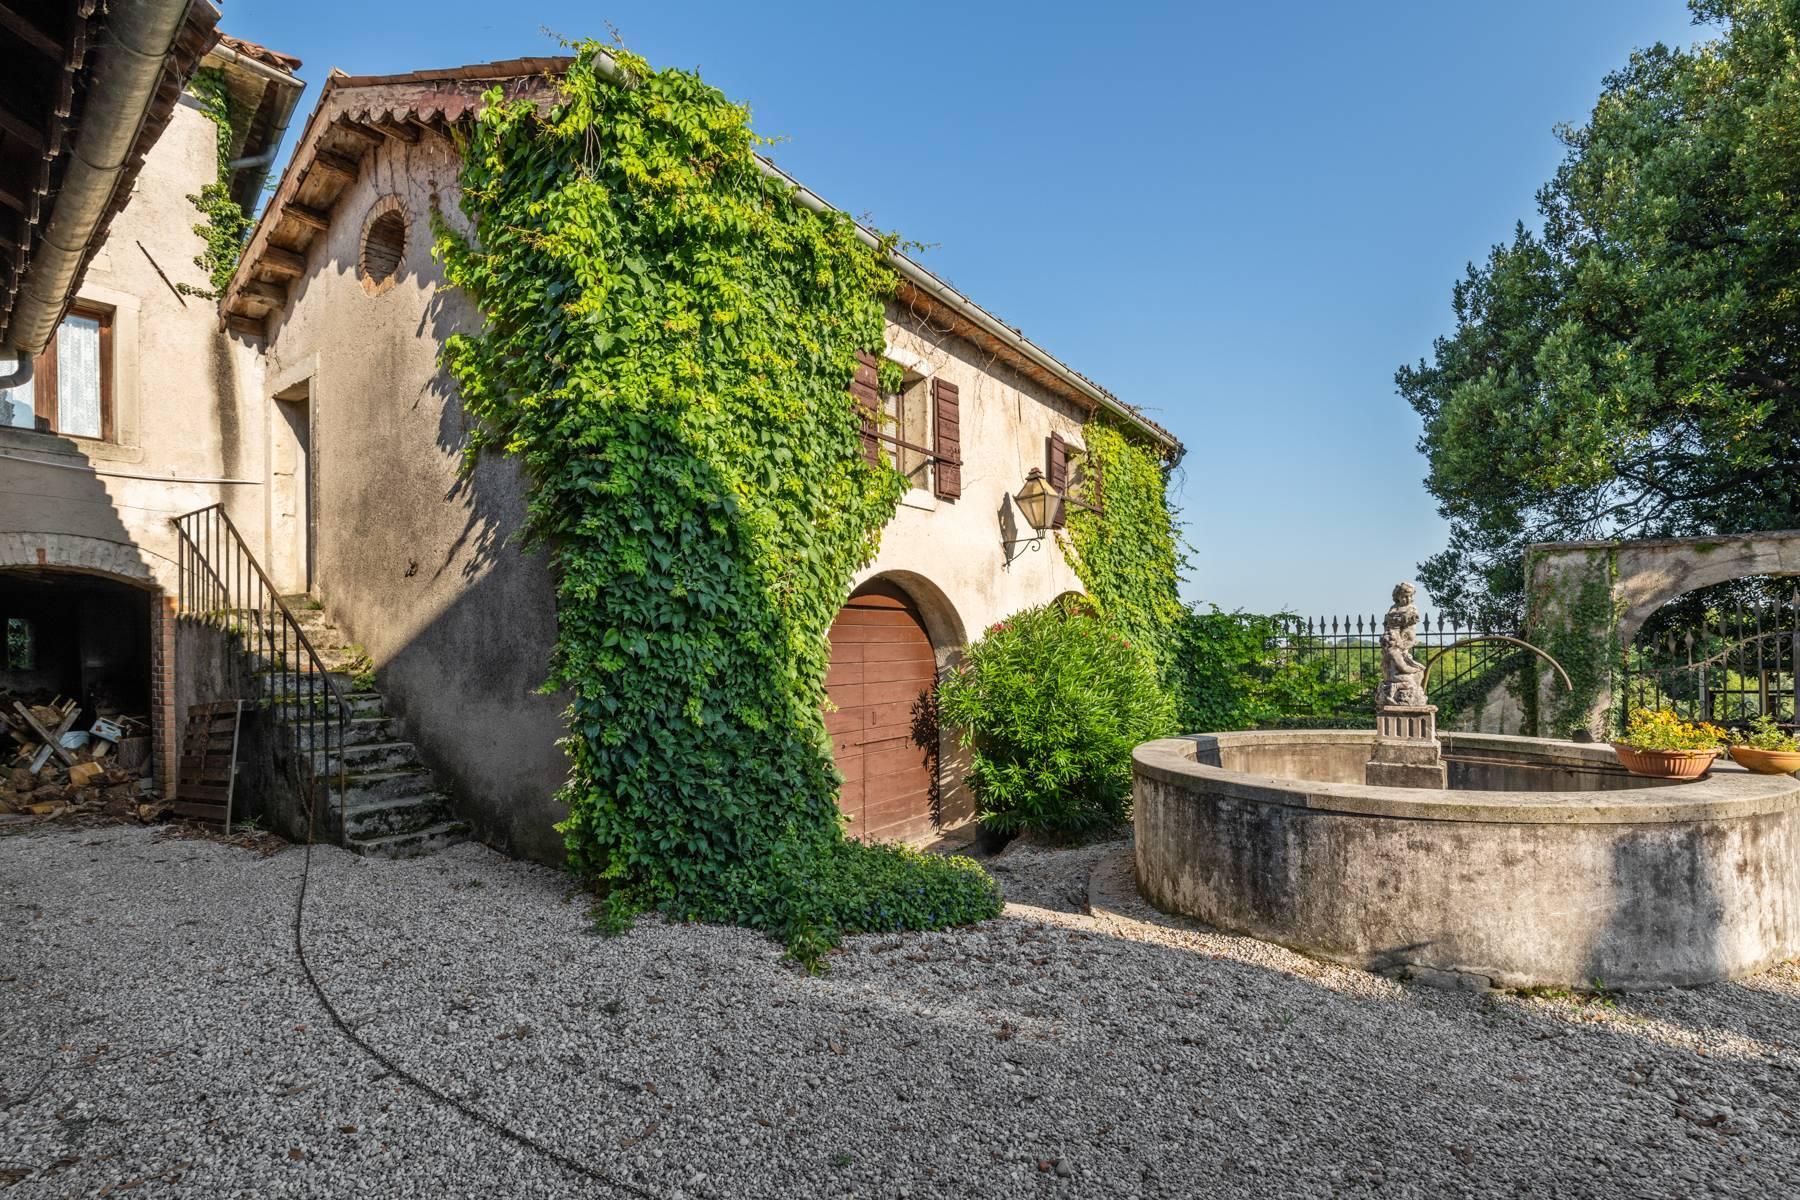 Elegant 17th century Venetian Villa with park on the hills of Treviso - 32